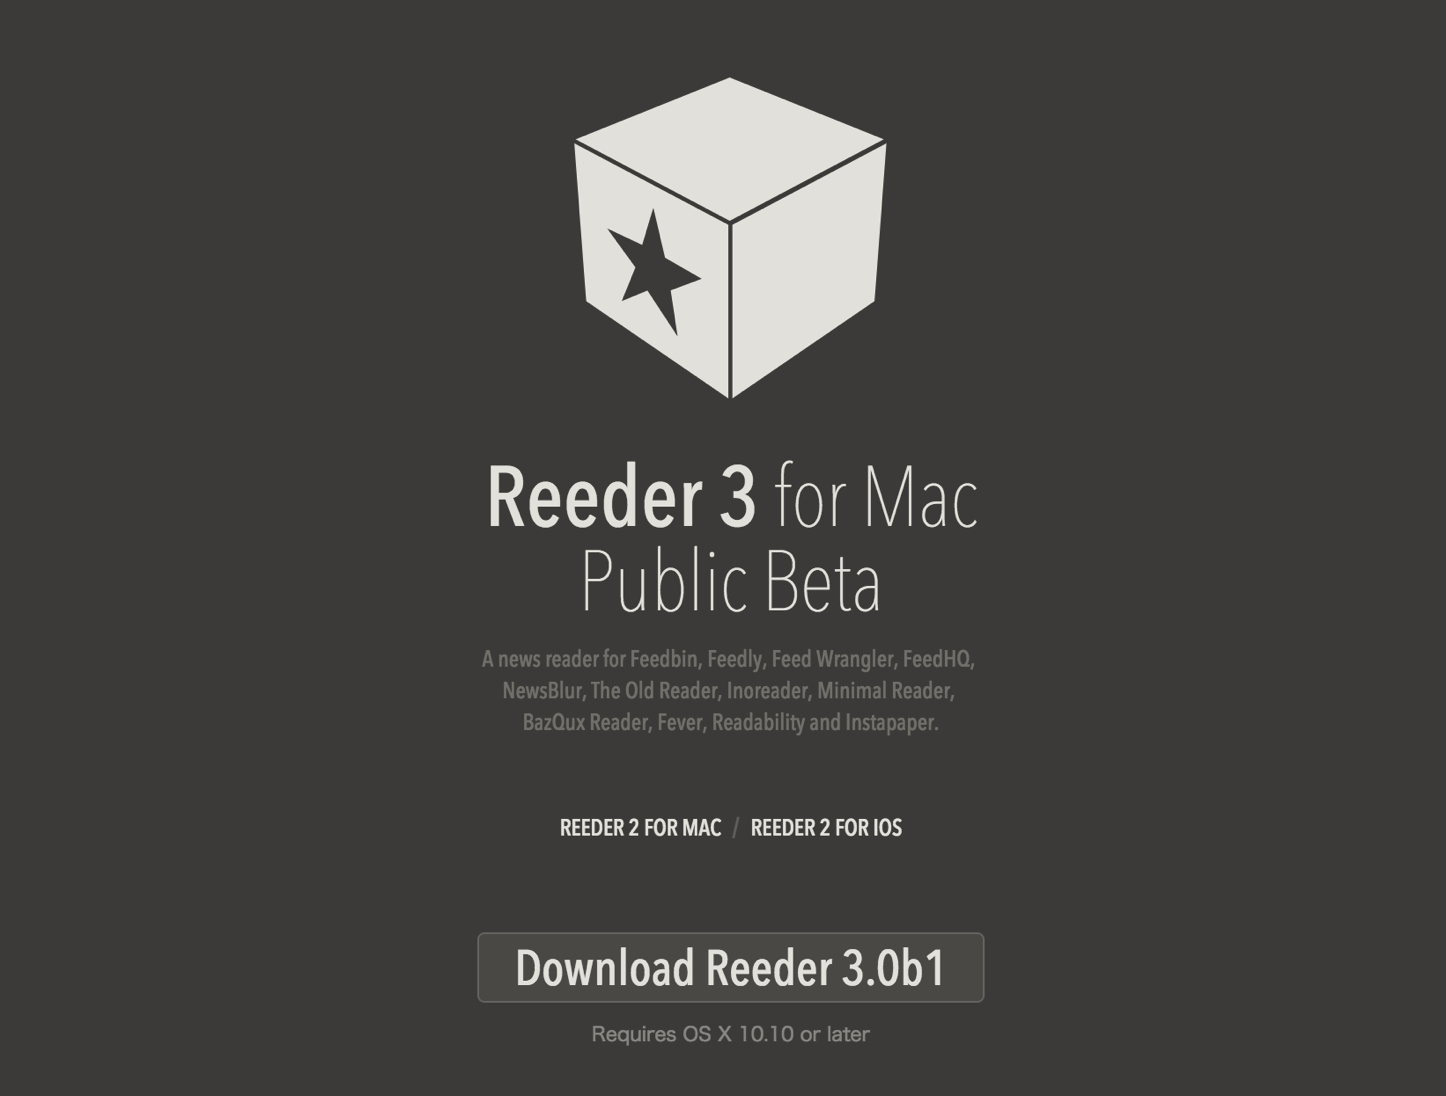 Reeder 3 for Mac Public Beta